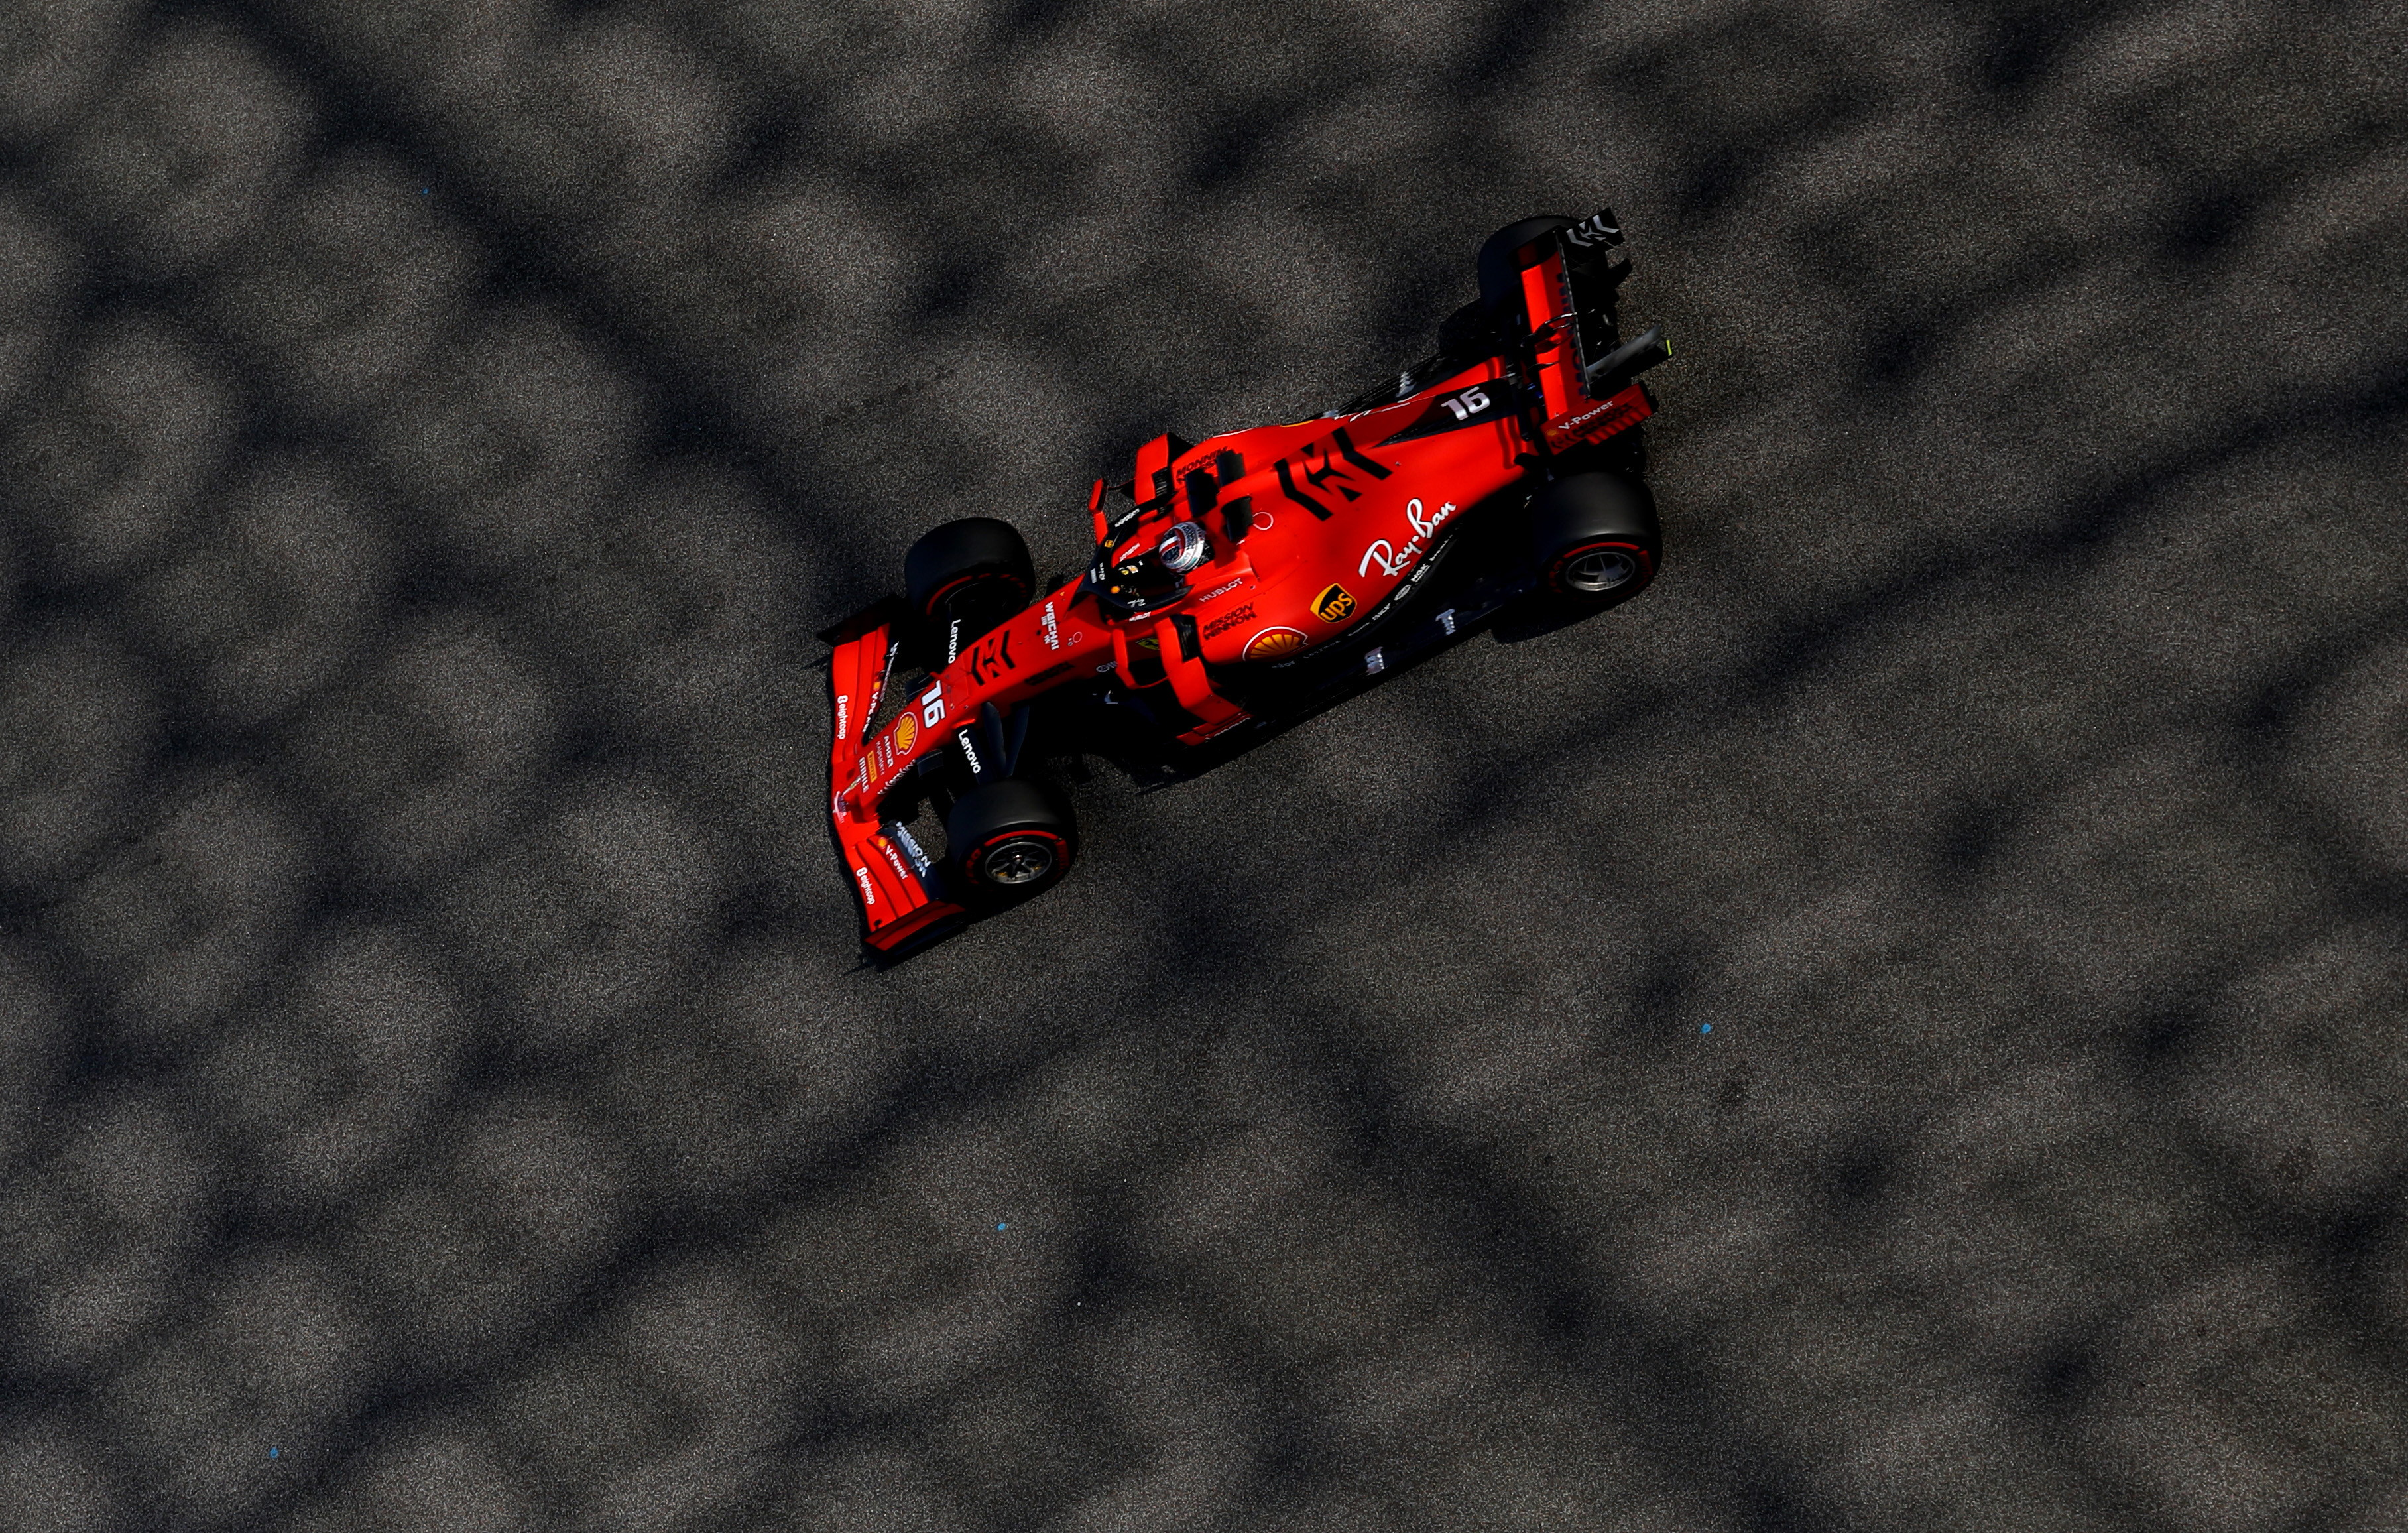 Russel il più veloce nei test Abu Dhabi, incidente Leclerc